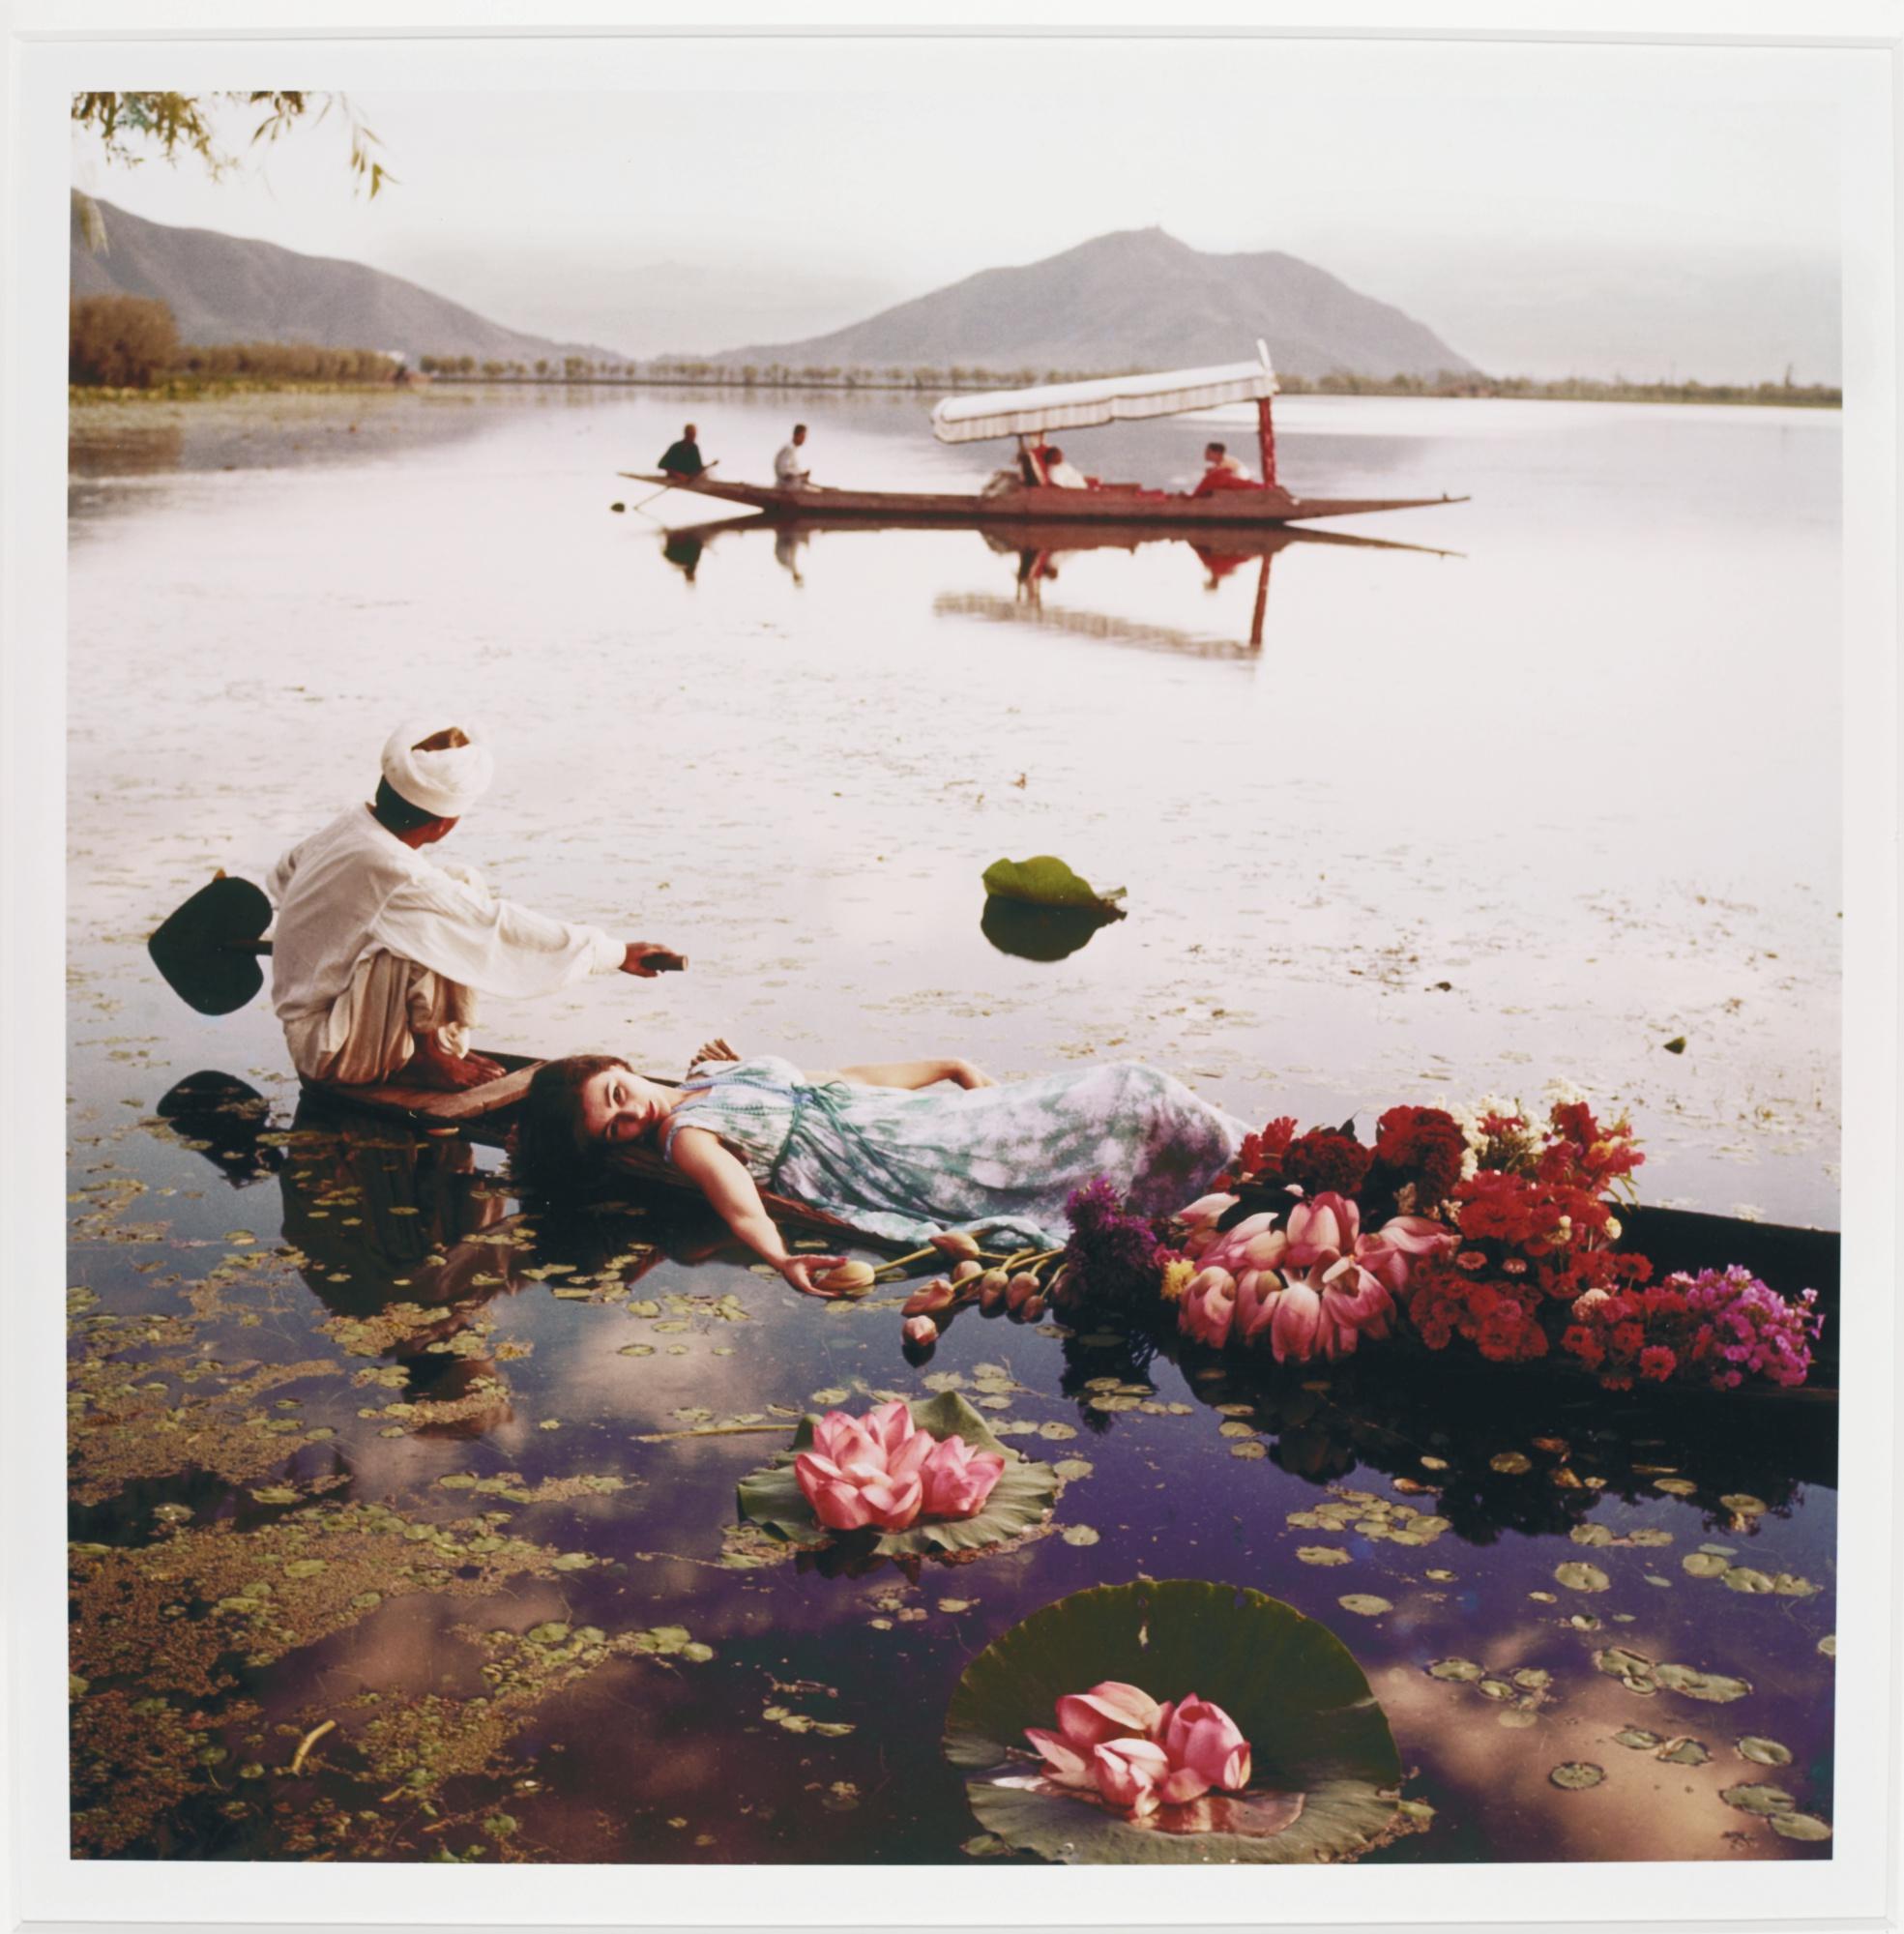 Norman Parkinson-Barbara Mullen Floating With Flowers Kashmir India Vogue 1956 Barbara Mullen Pale Cool Of Kashmir India Vogue 1956-